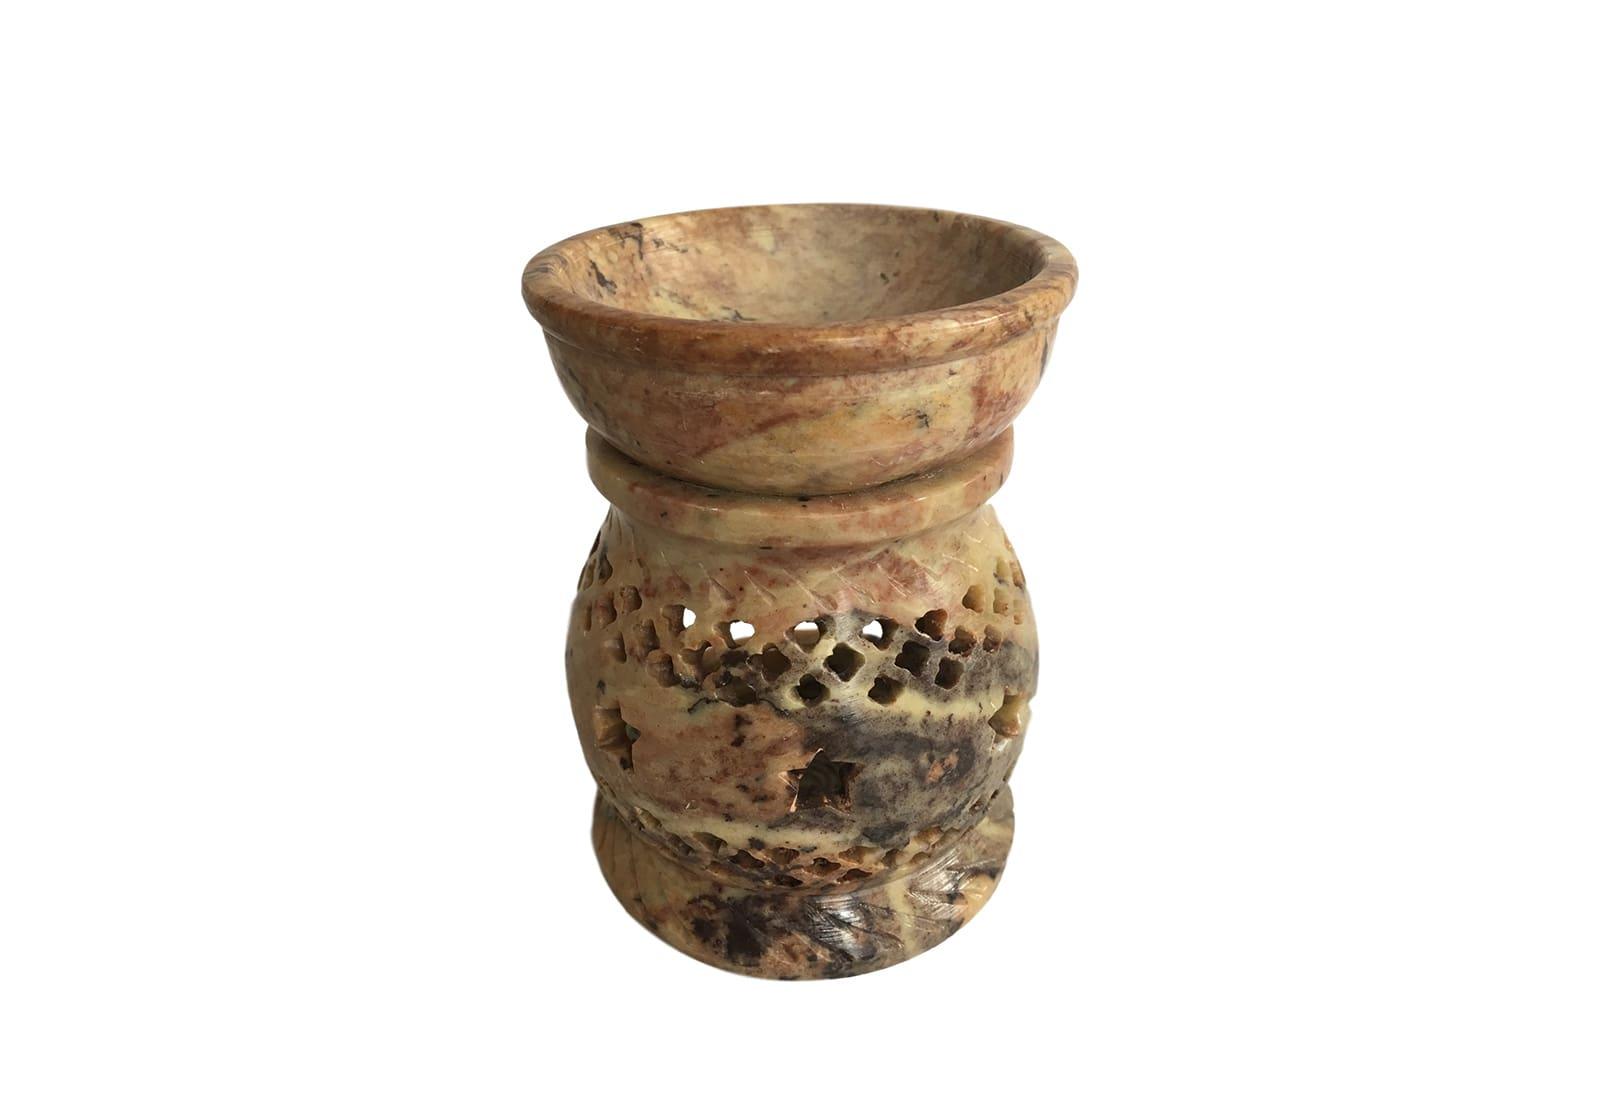 Фото Аромалампа каменная круглая 10*7,5*7,5 см Индия (арт.507)